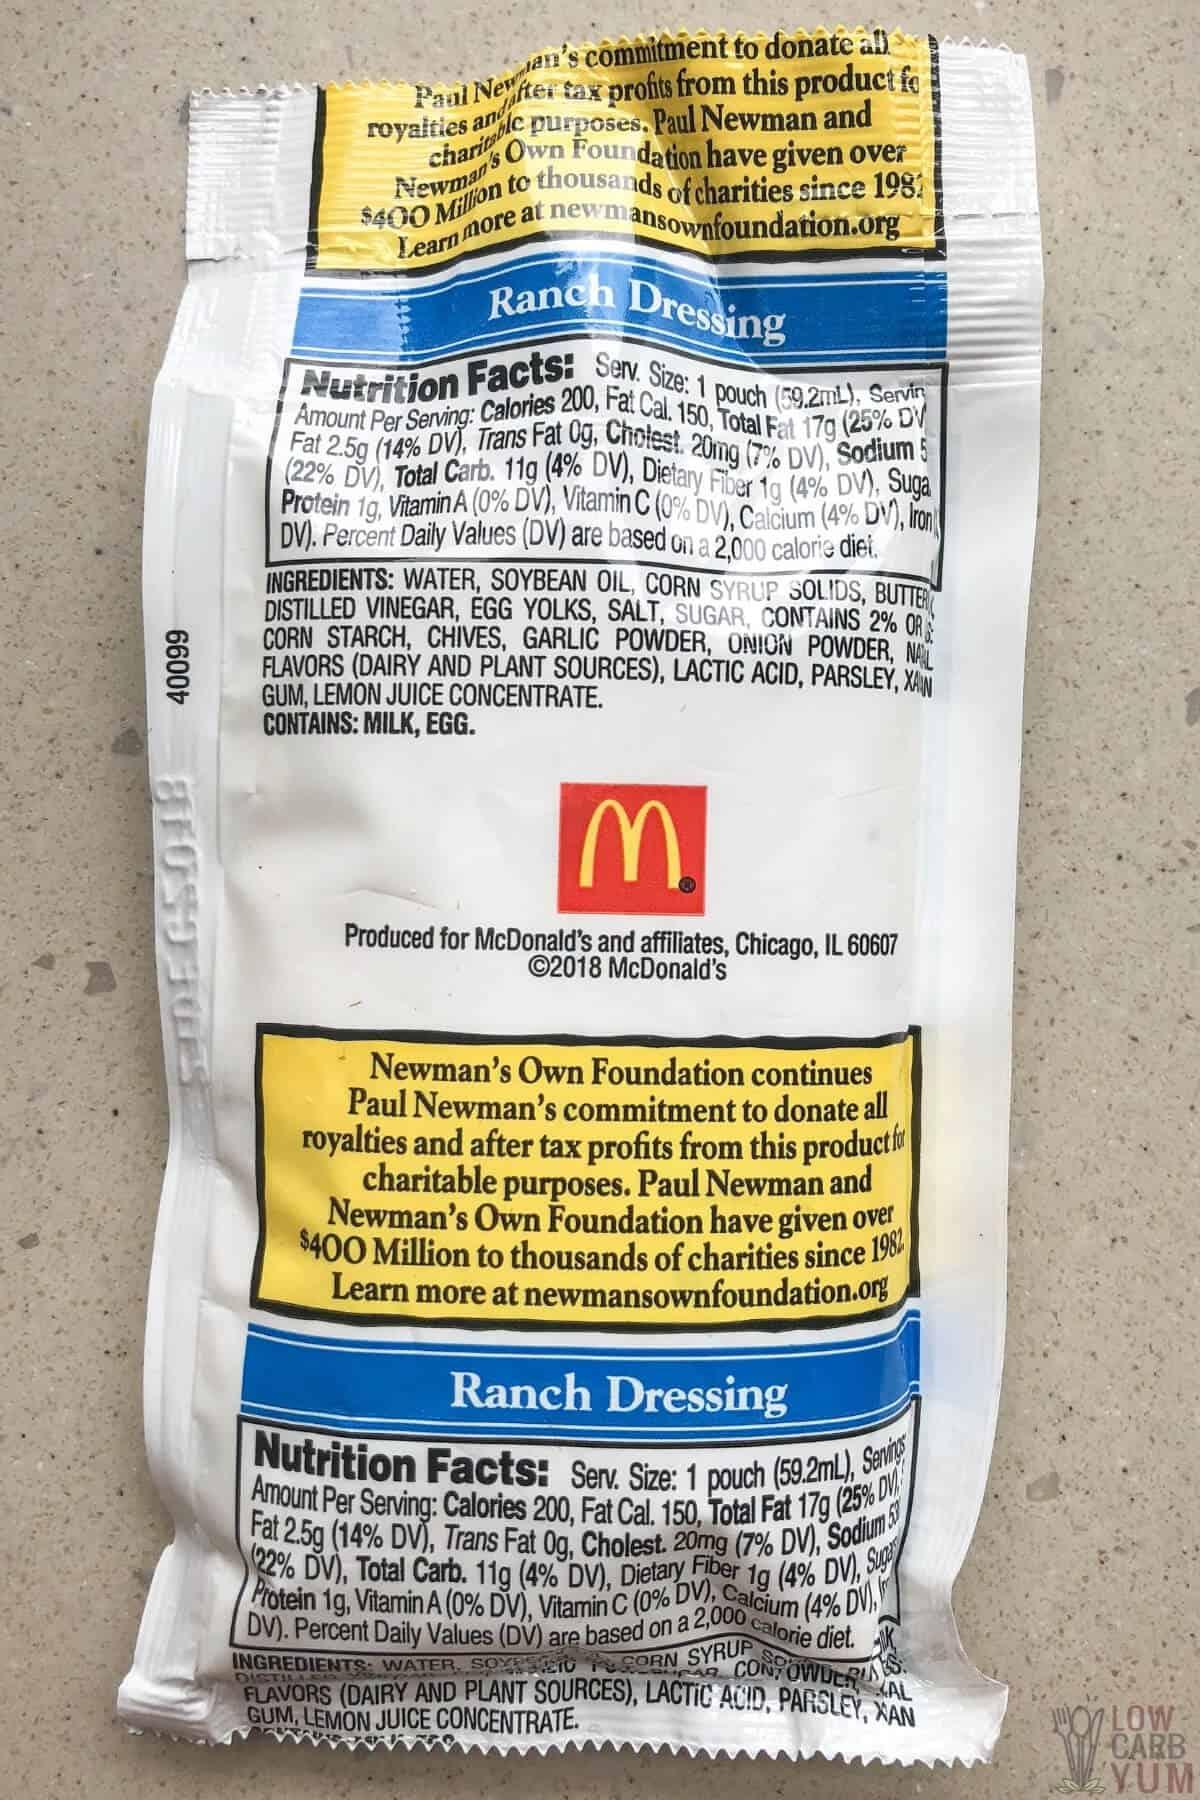 mcdonalds ranch dressing packet label